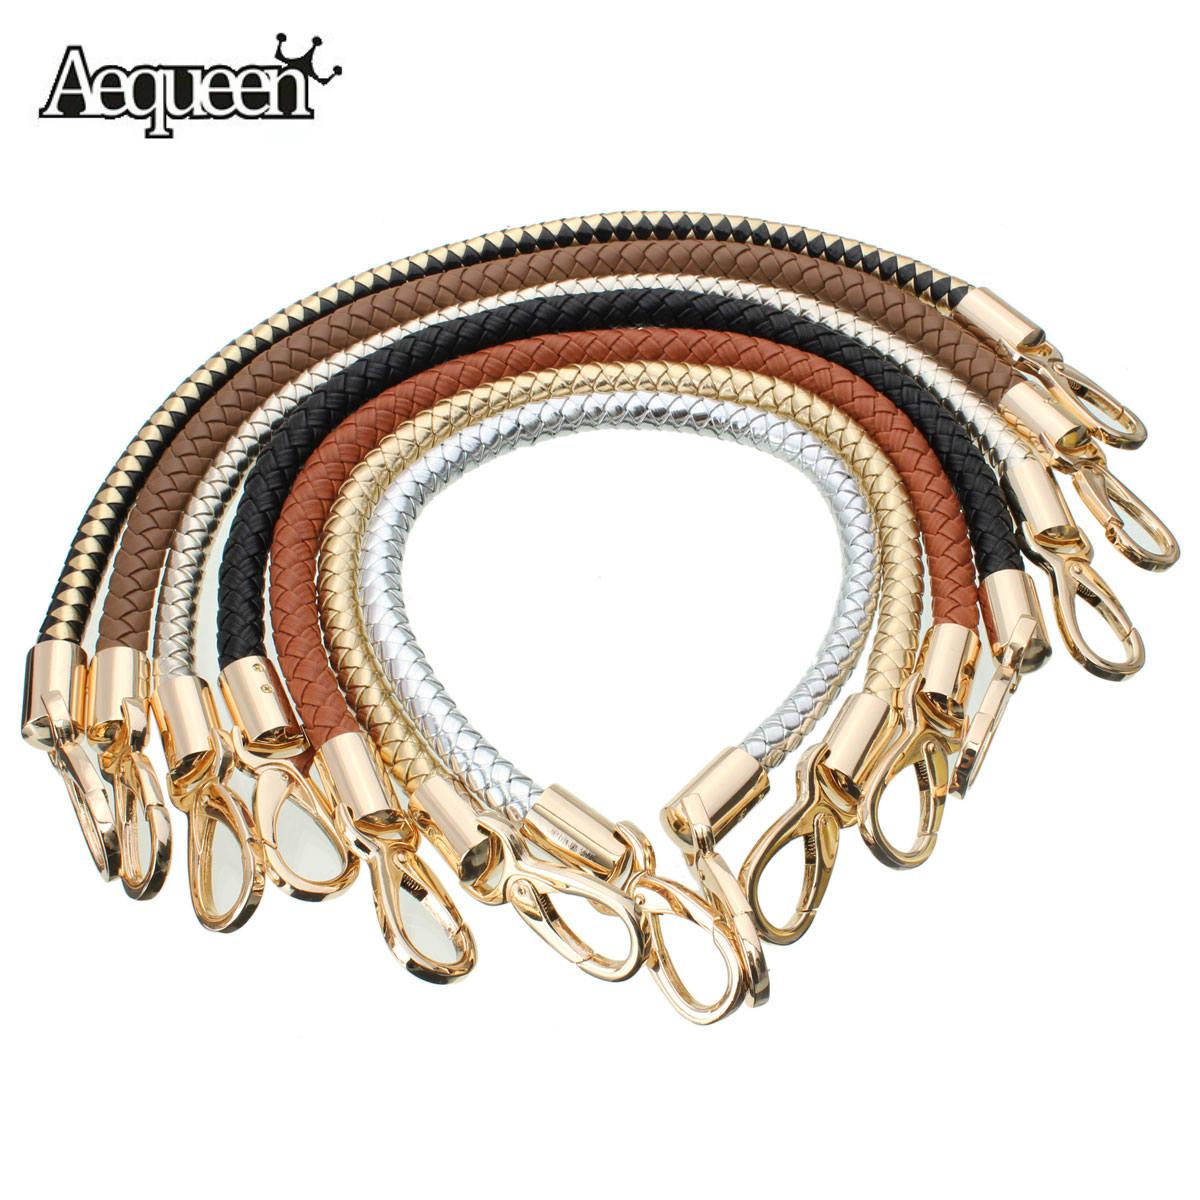 49cm Length New Design Bag DIY Replacement Accessaries Shoulder Bags Belt Handle DIY Replacement Handbag Strap Accessories